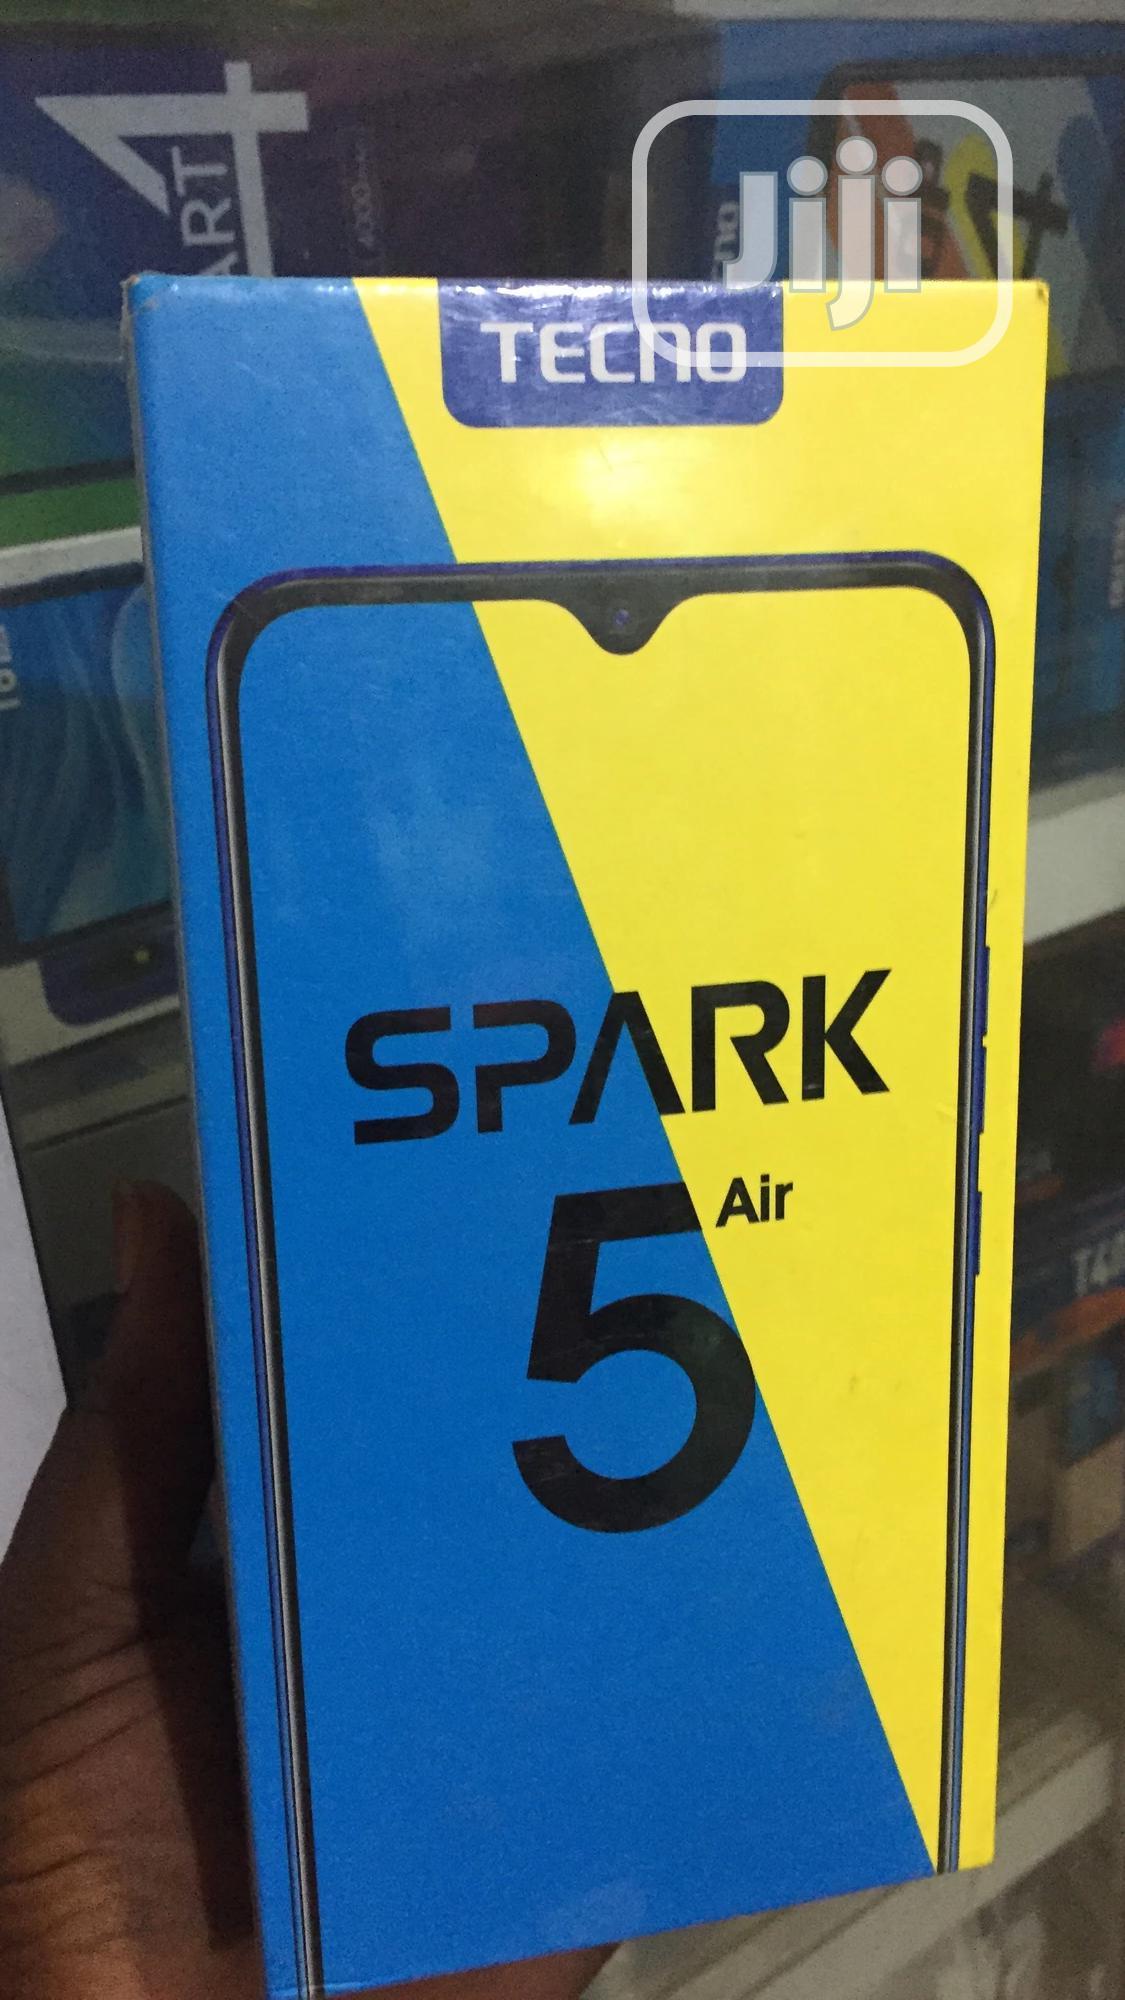 New Tecno Spark 5 Air 32 GB Black | Mobile Phones for sale in Ikeja, Lagos State, Nigeria